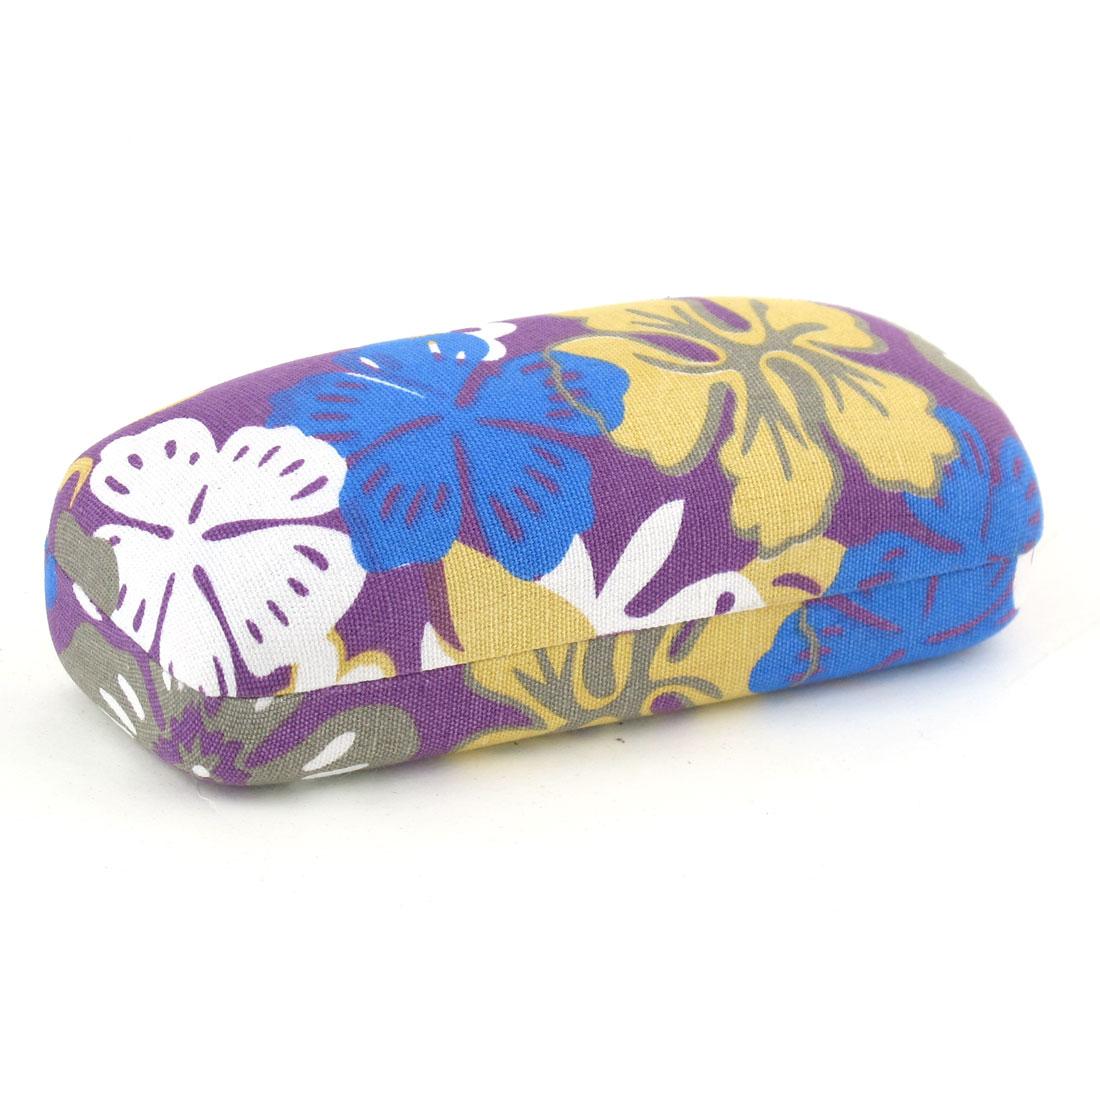 Colorful Flower Printed Farbic Coated Metal Eyeglasses Holder Case